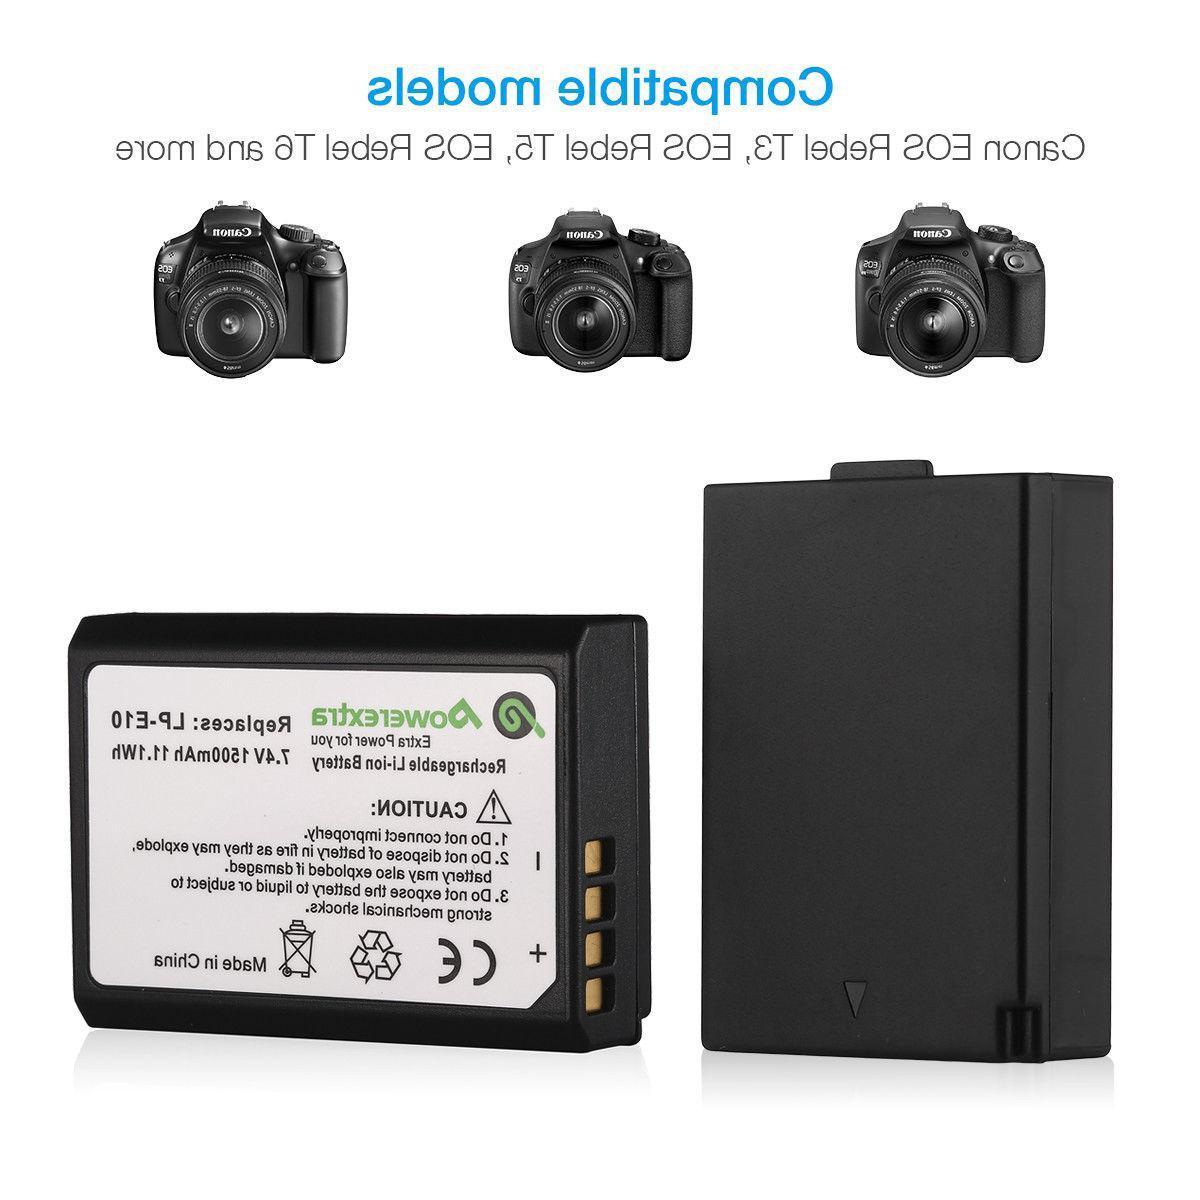 LP-E10 Battery For Canon Rebel T3 T6 T5